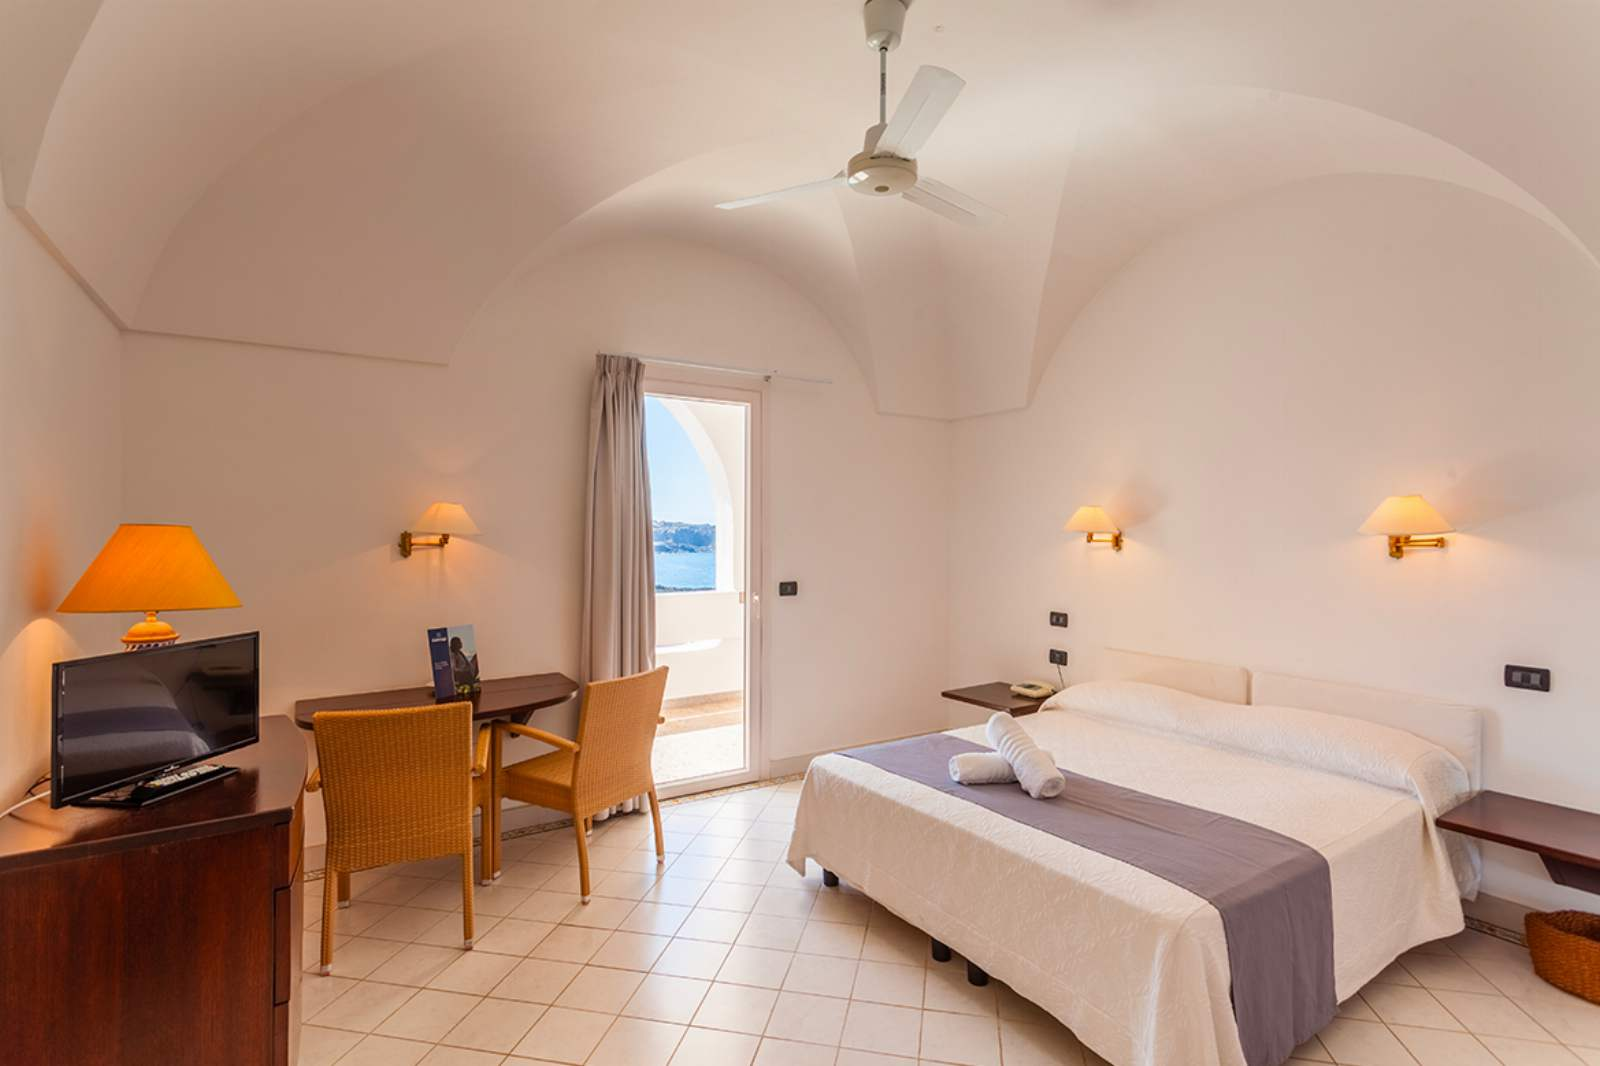 Mursia Resort & Spa: room / property / locale photo. Image 3